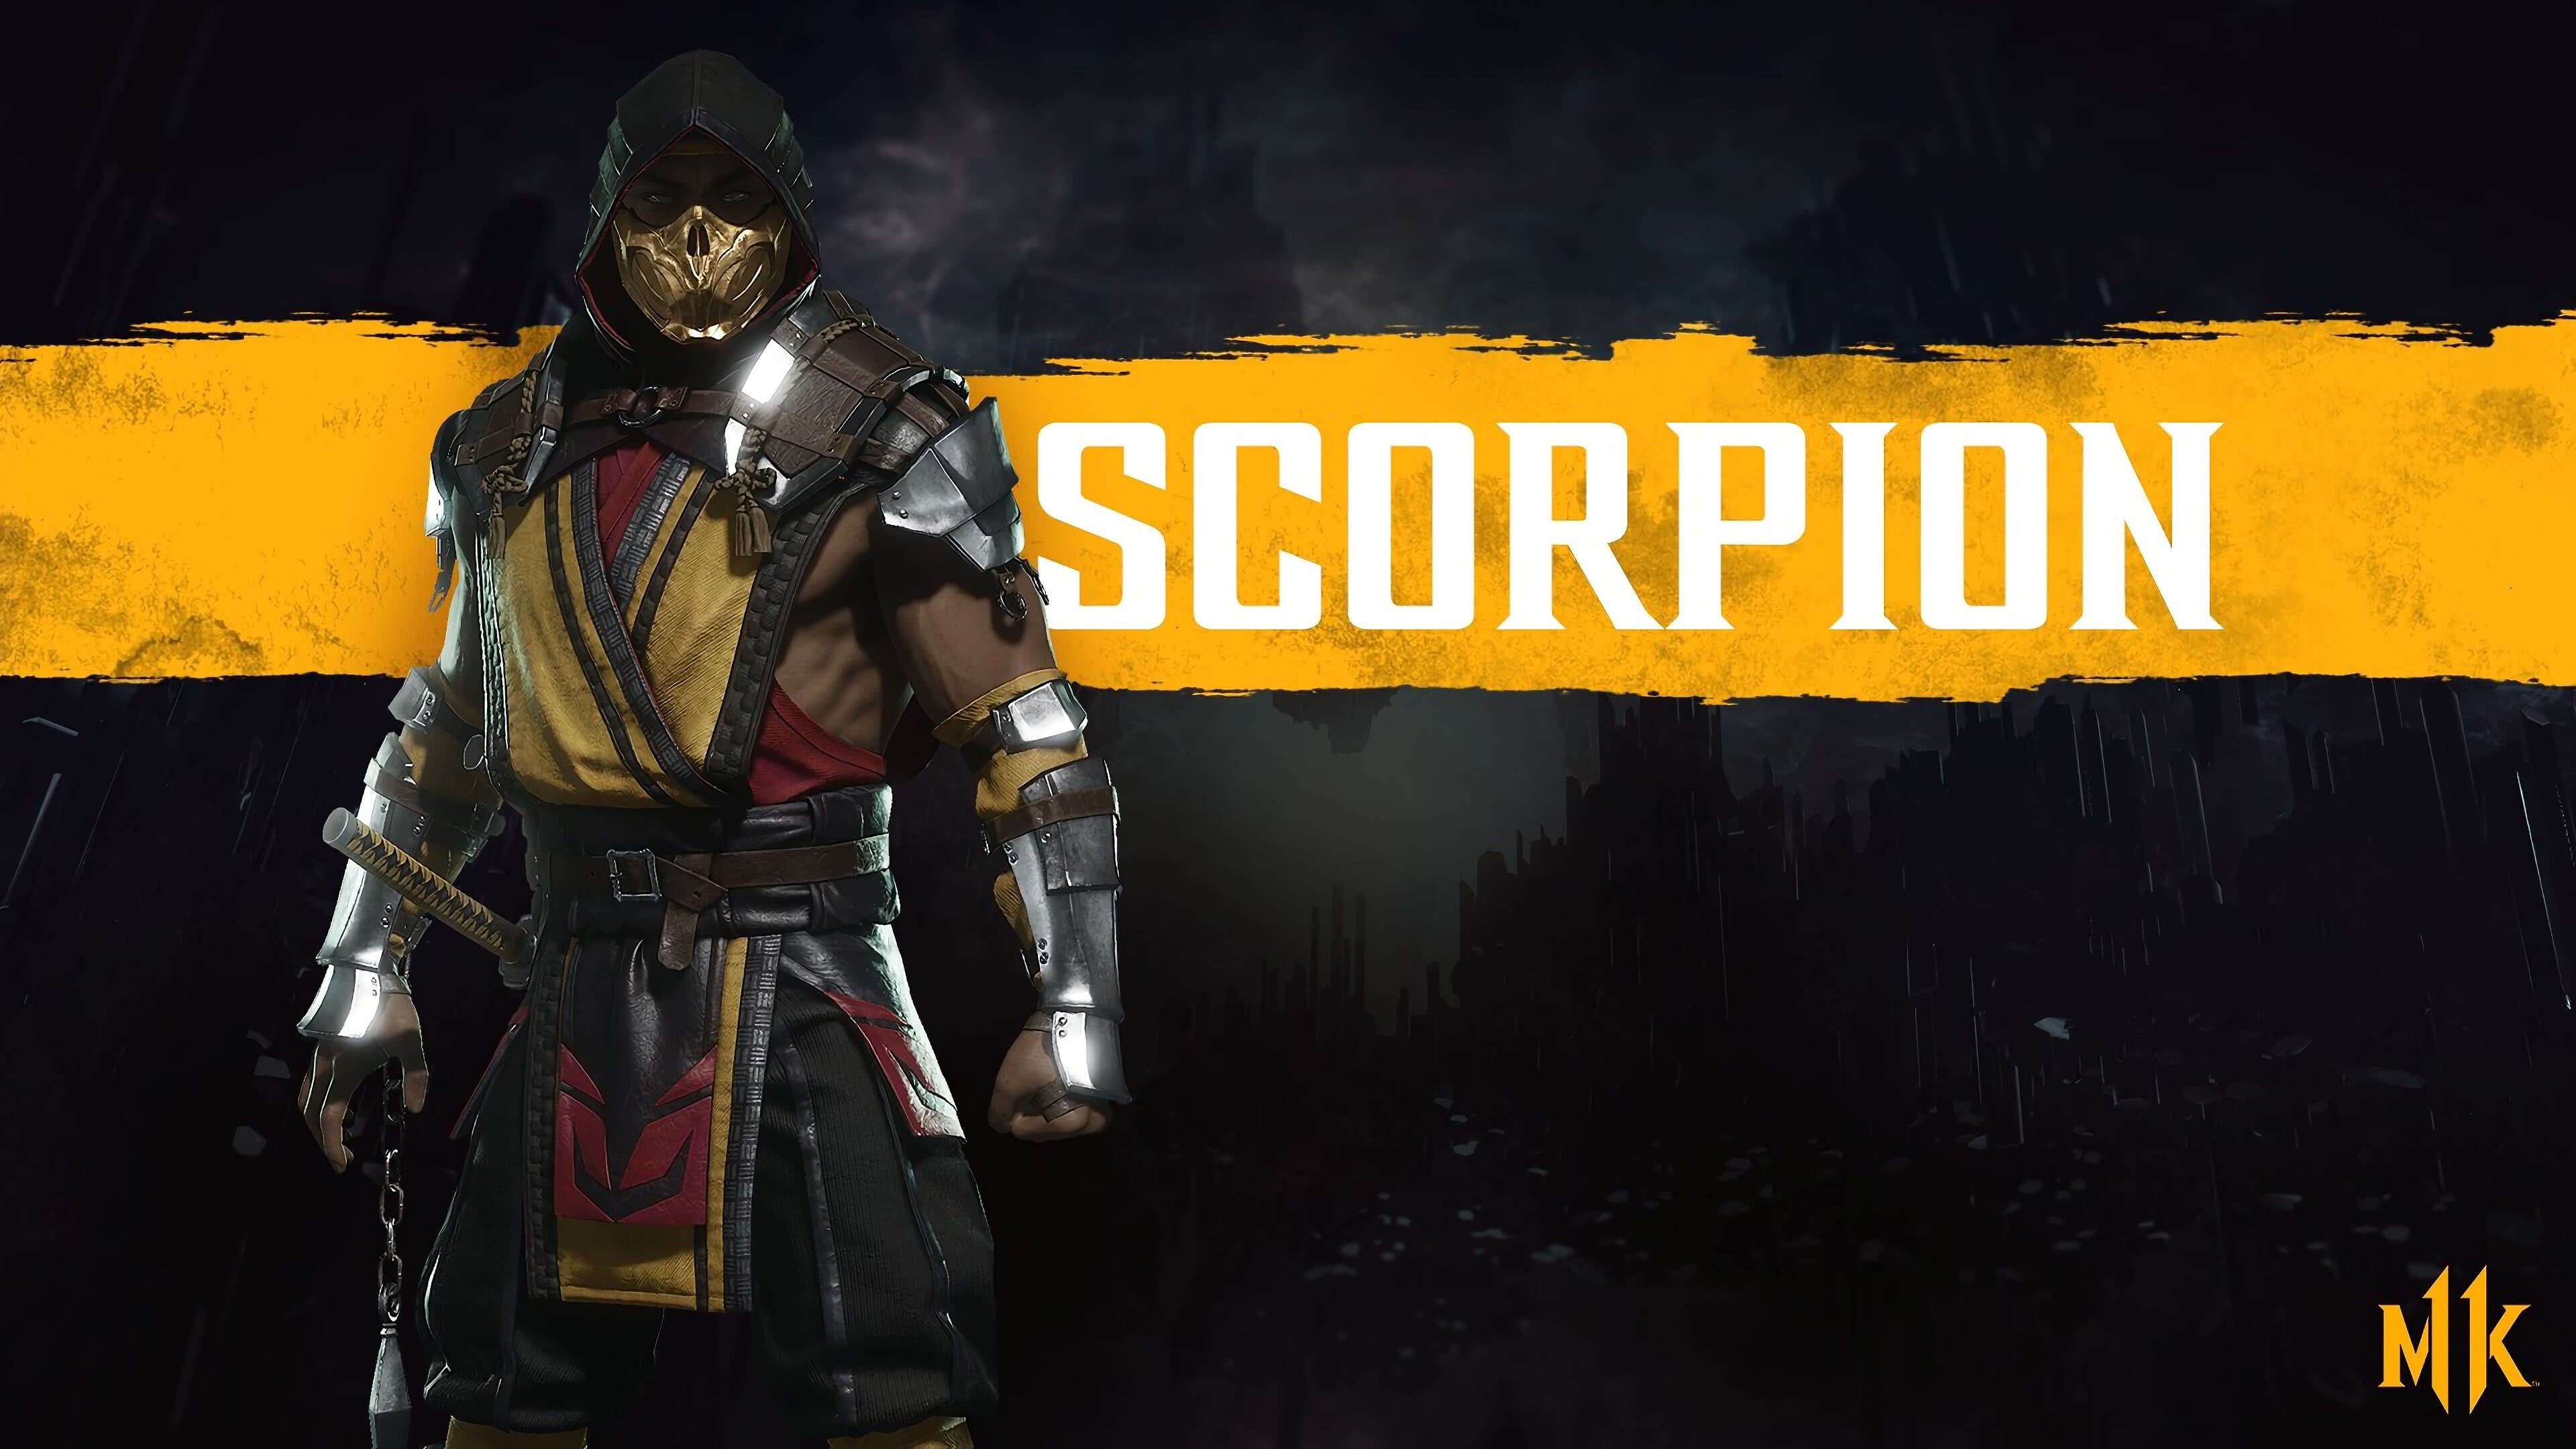 Mortal Kombat 11 Scorpion Uhd 4k Wallpaper Pixelz